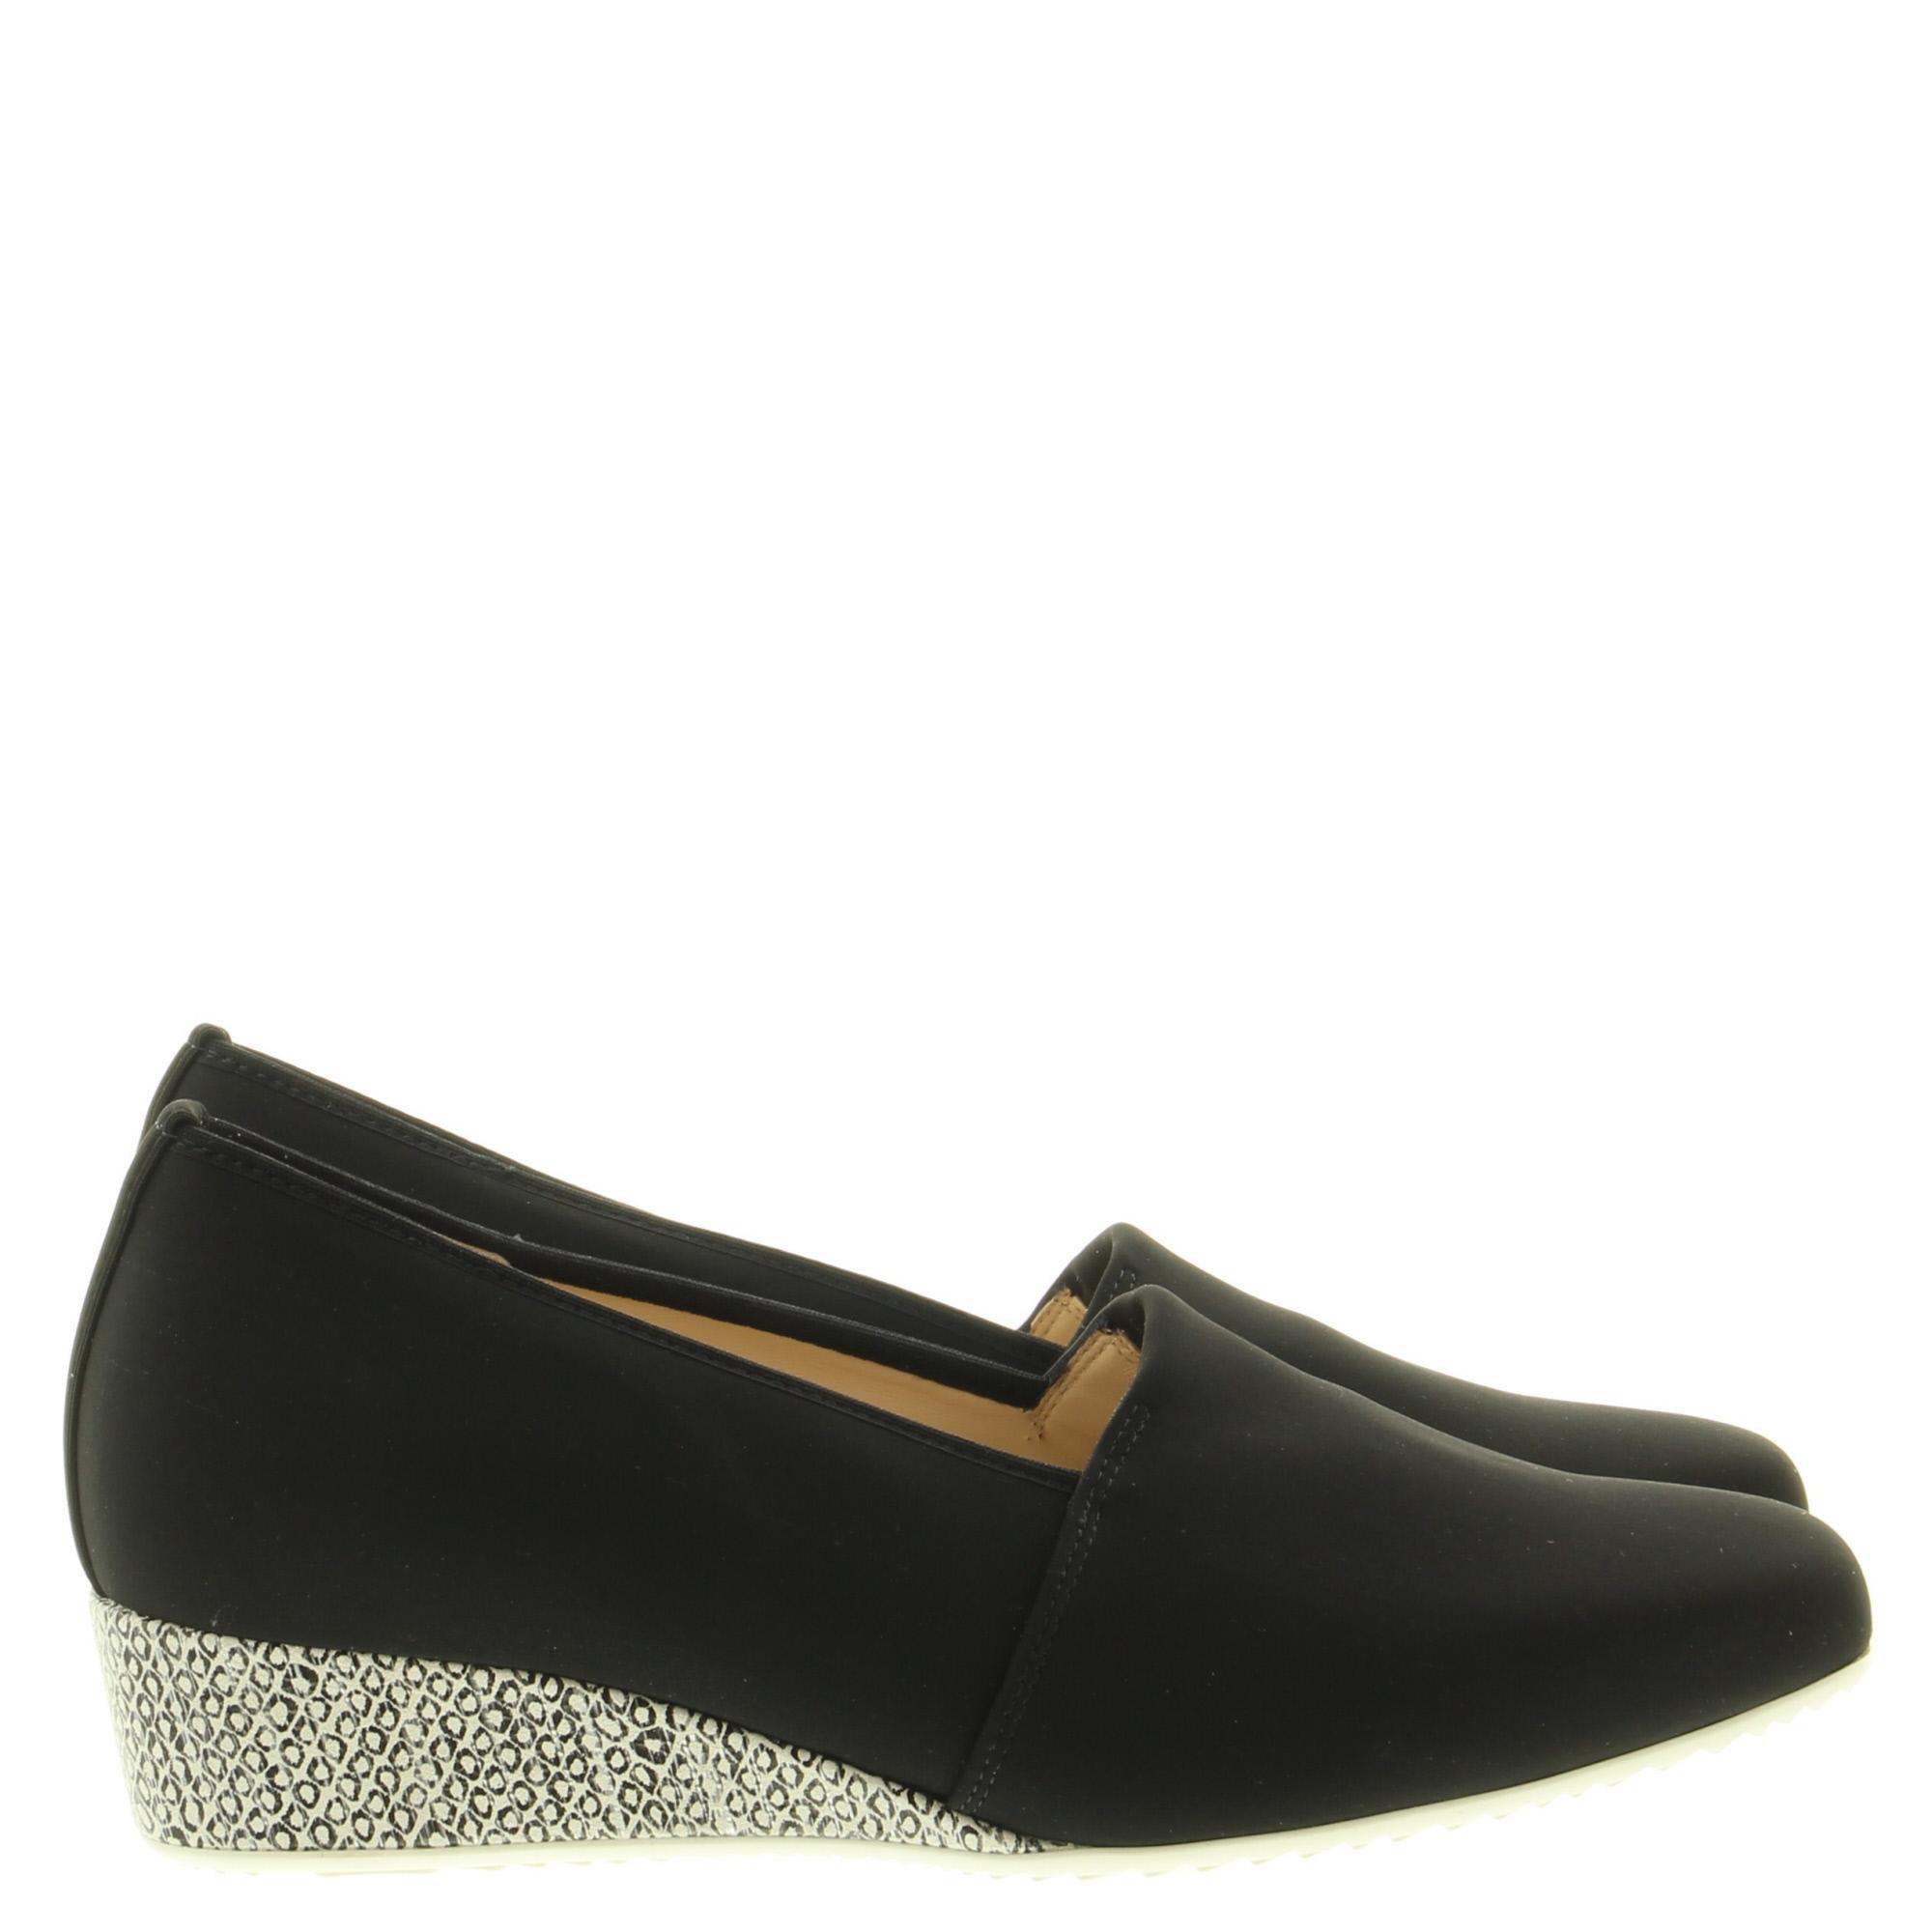 Hassia Shoes 303283 Jesolo 0104 Schwarz Offwhite